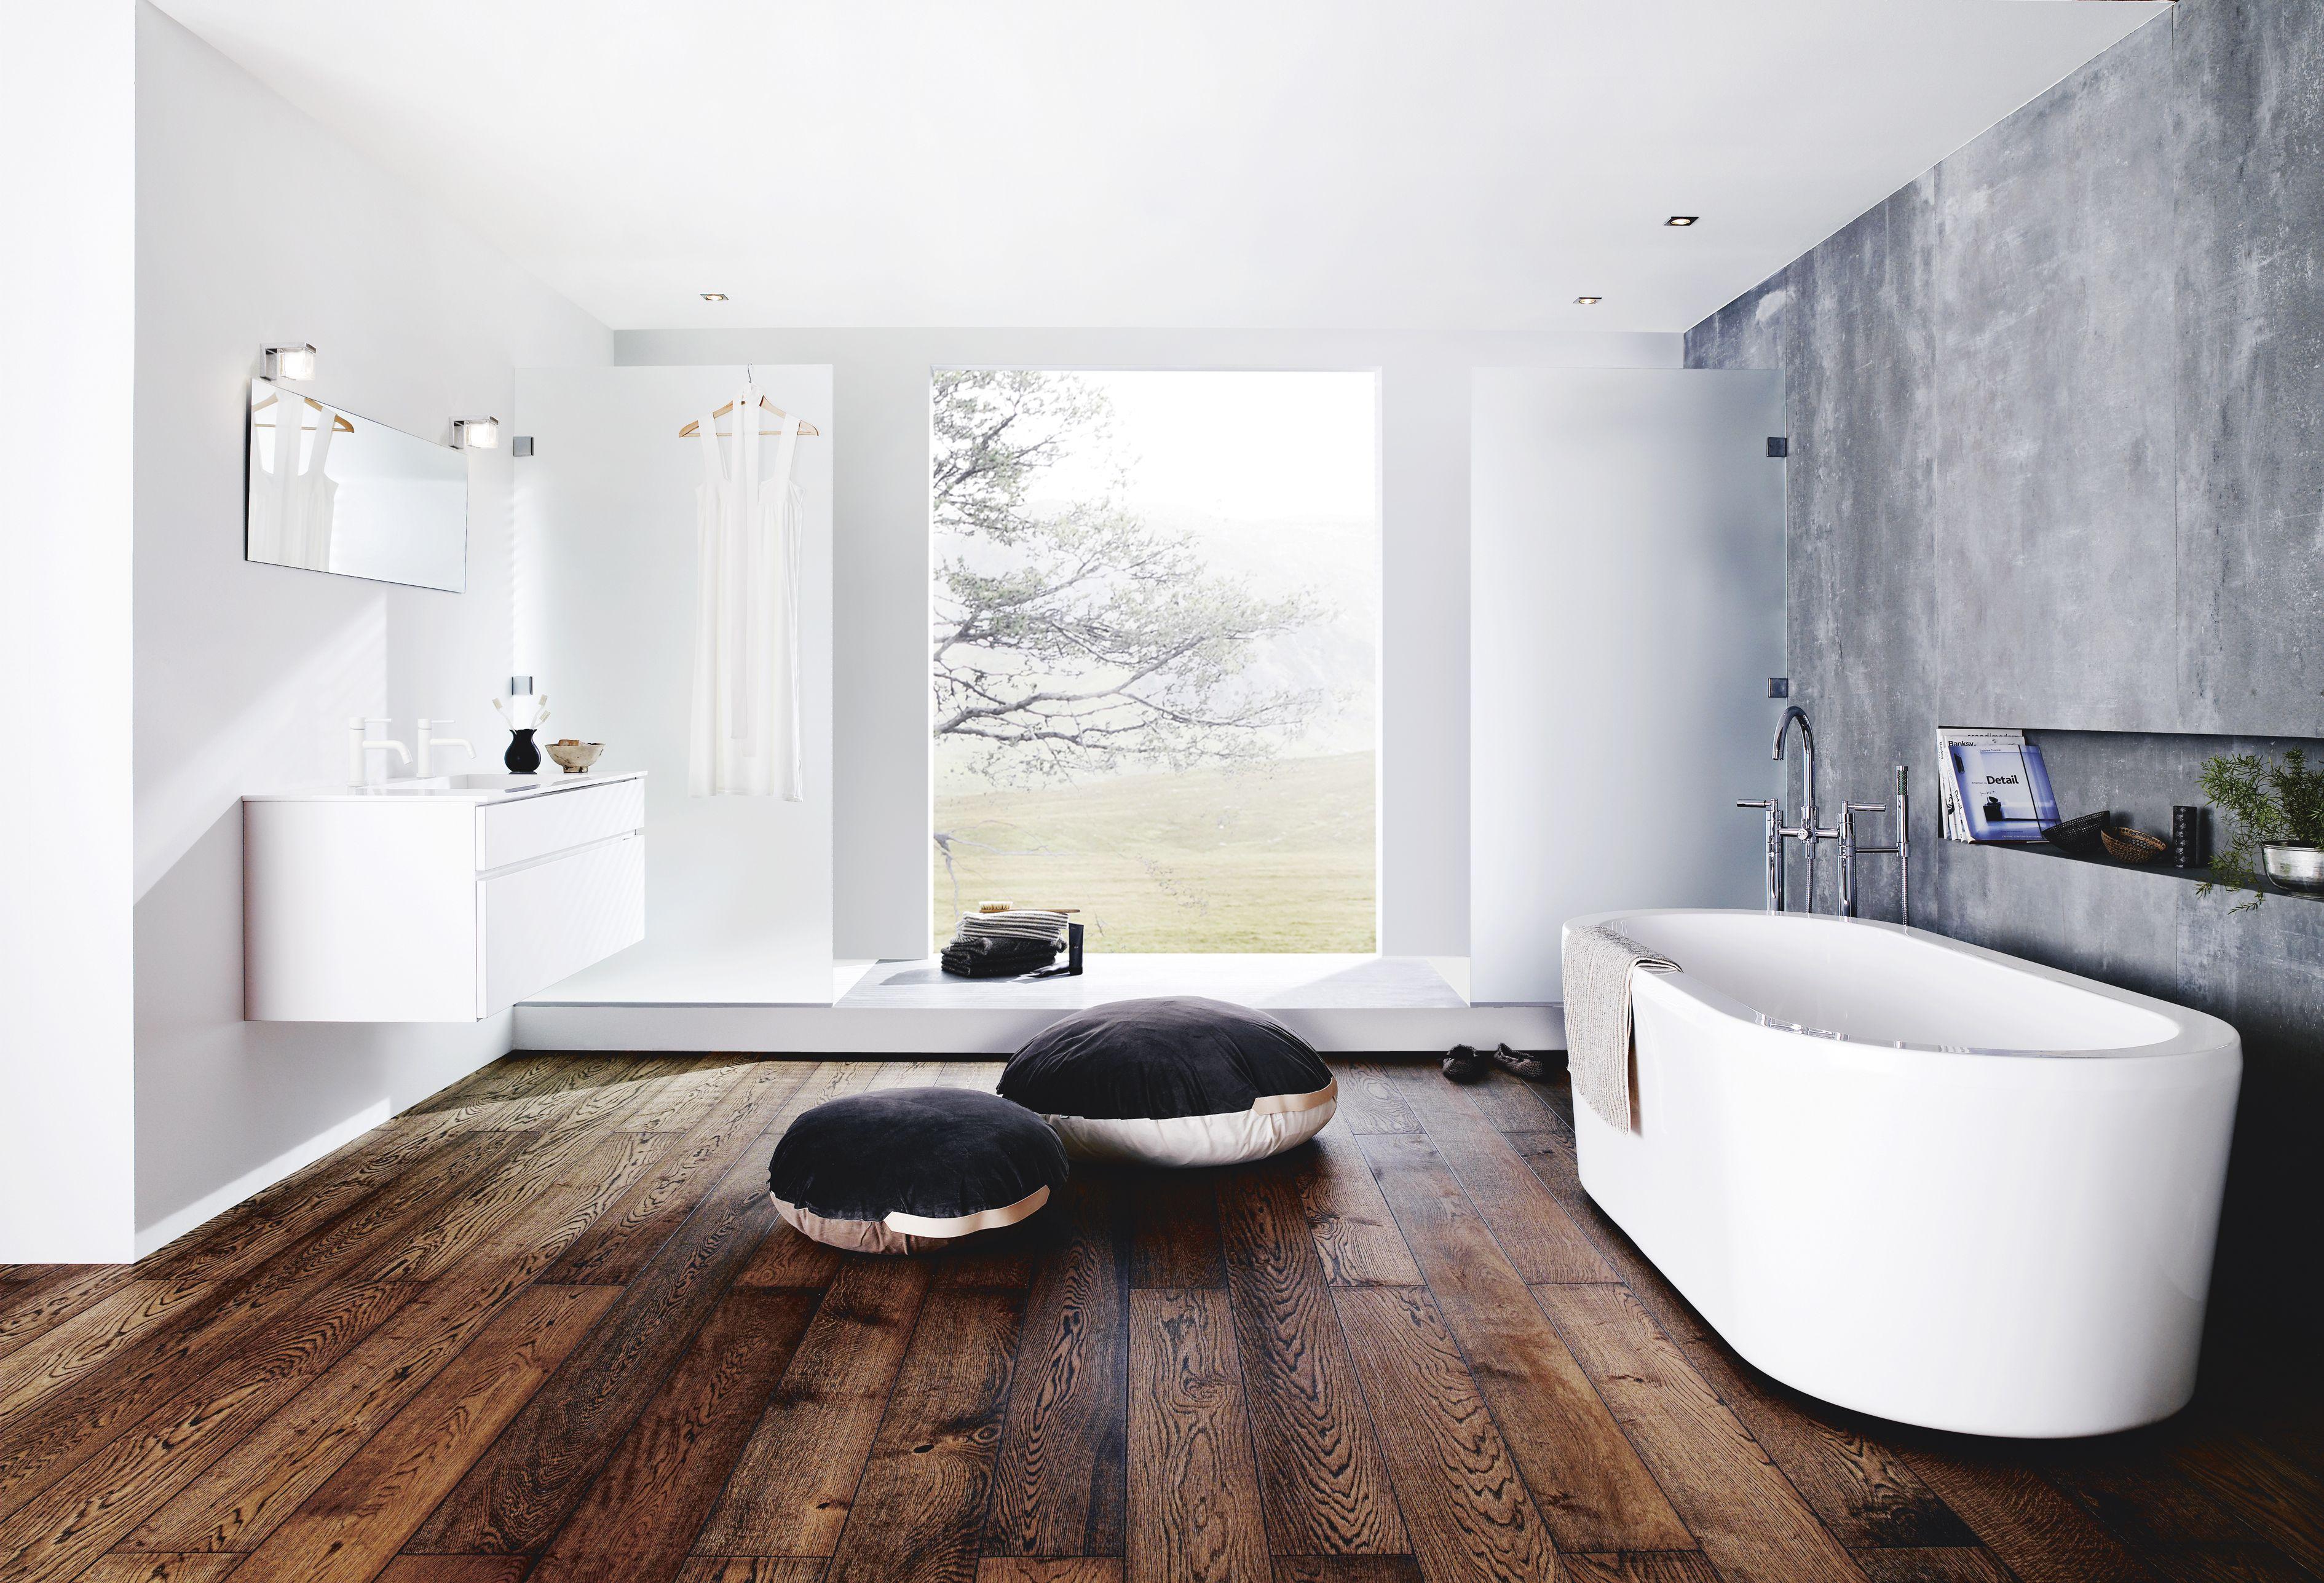 Kvik - Mano Badkamer | Home | Pinterest | Bathroom inspo, Interior ...